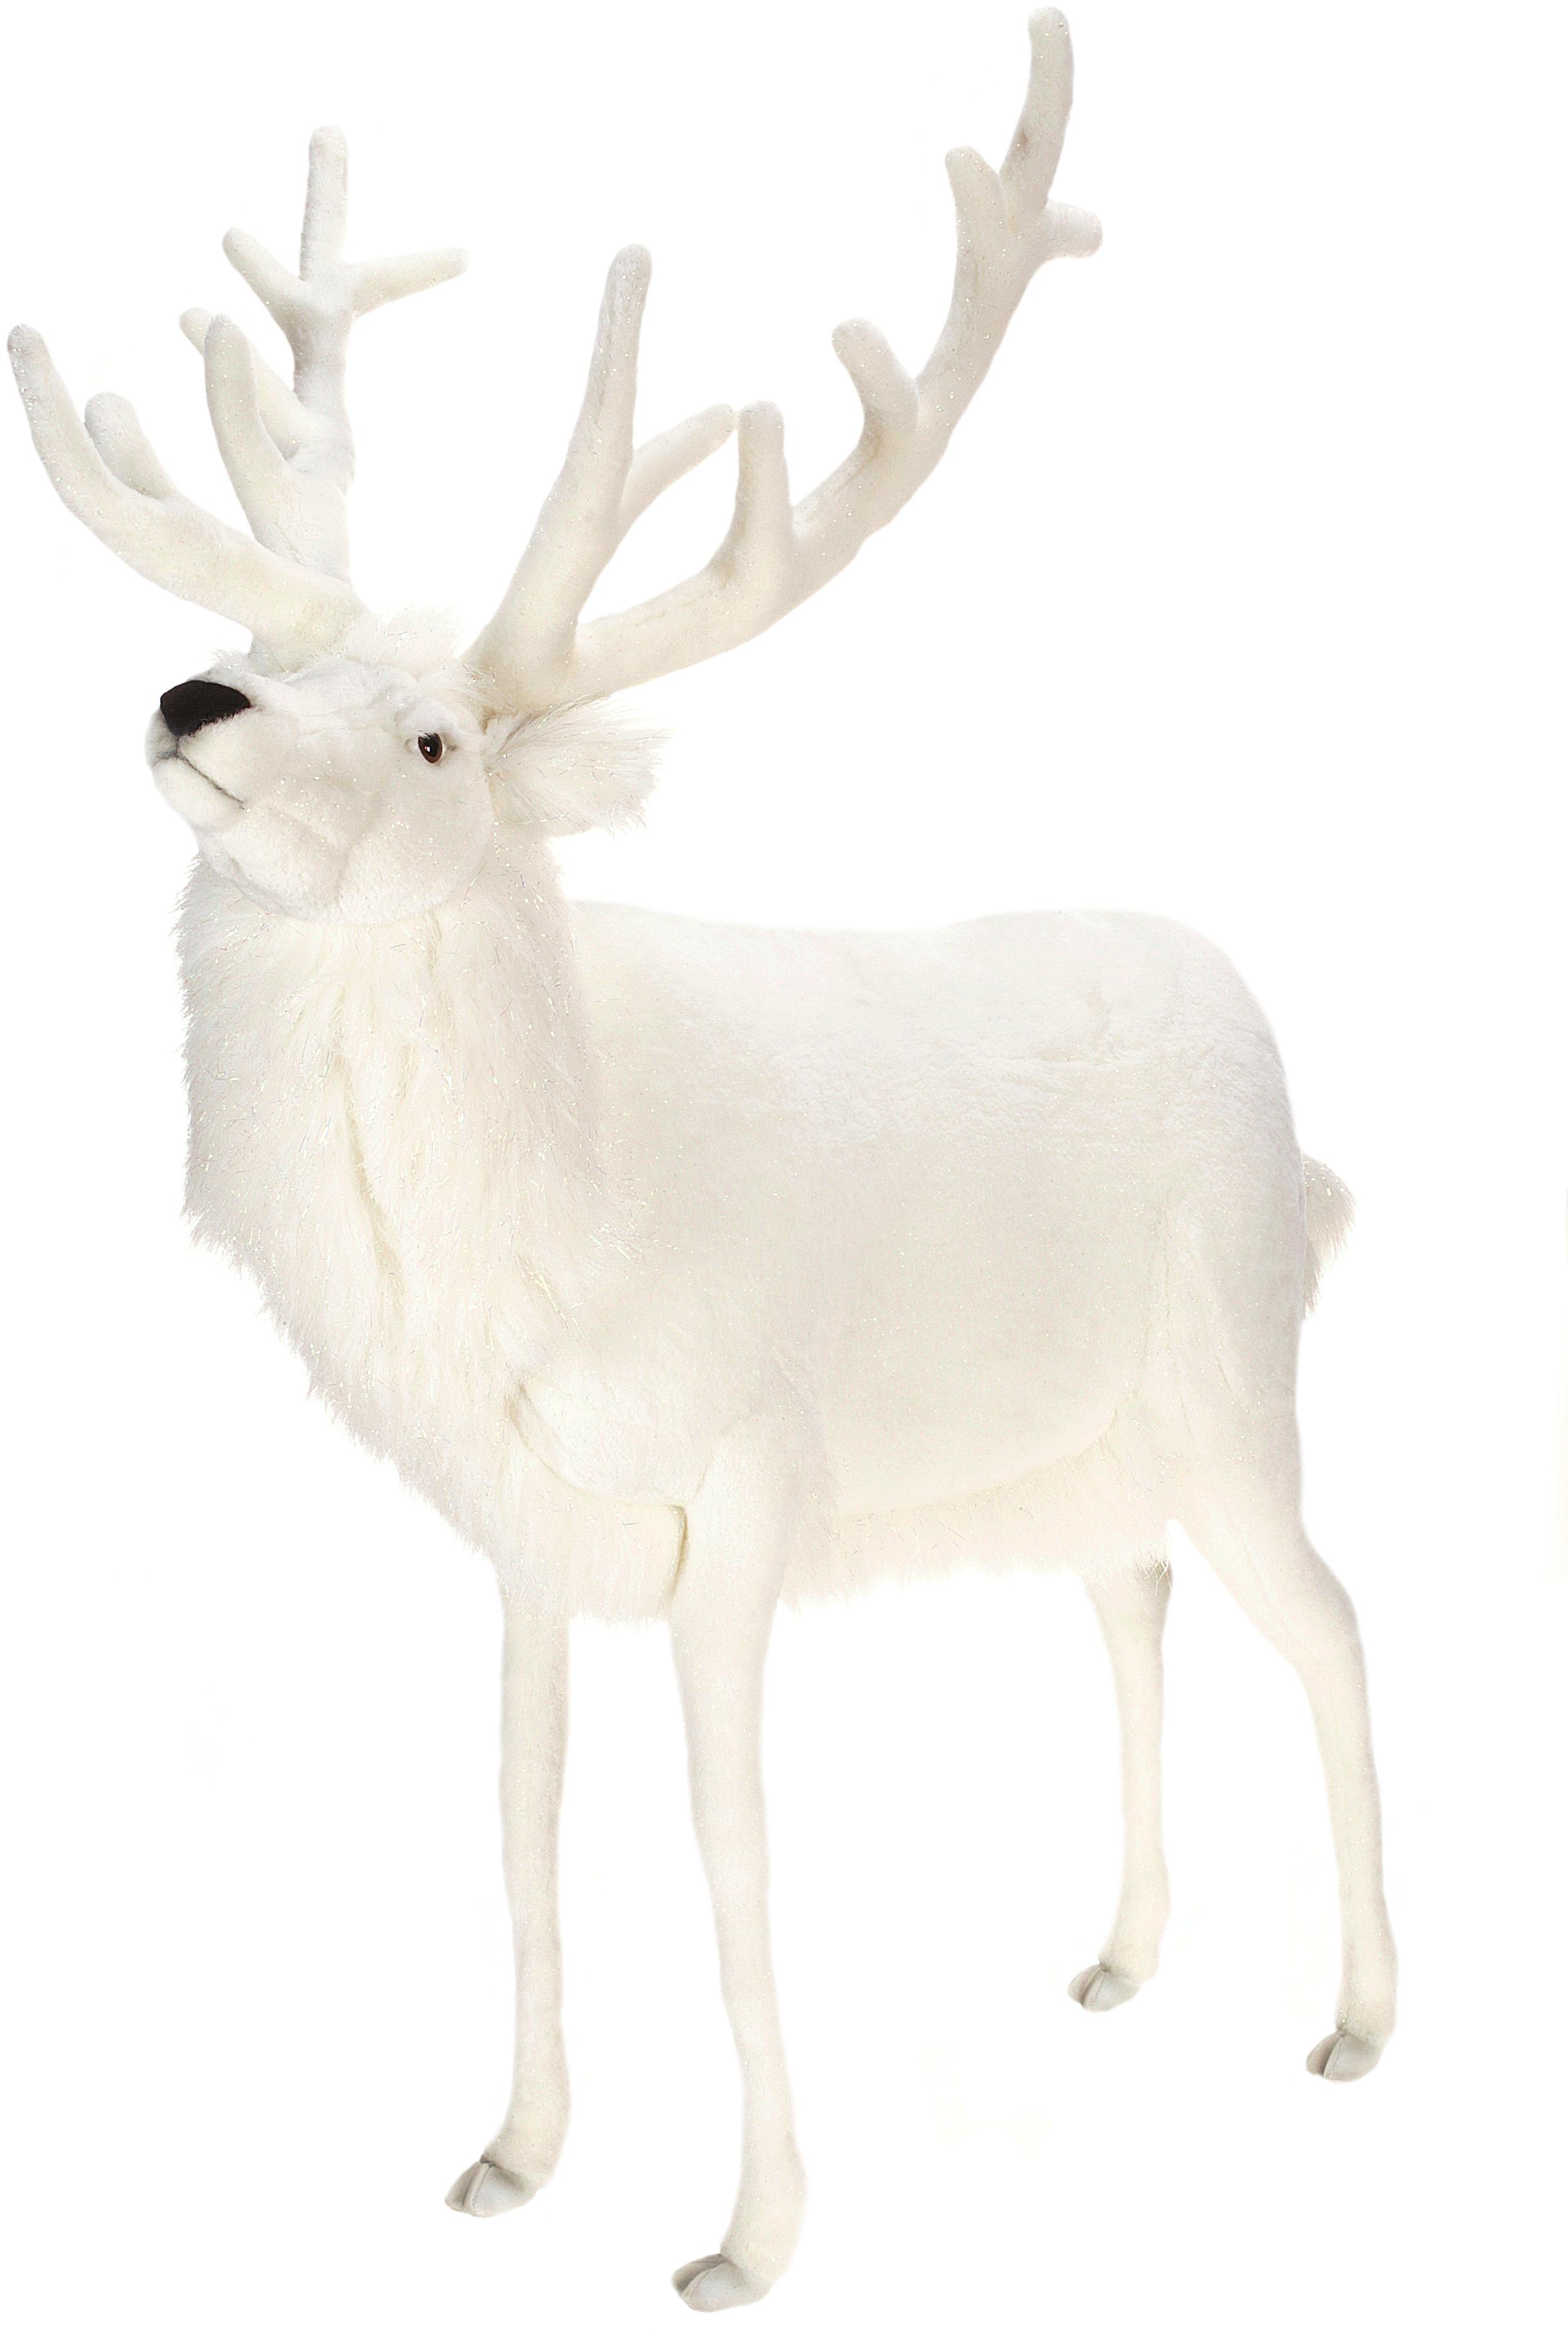 48 Quot White Deer Stuffed Animal